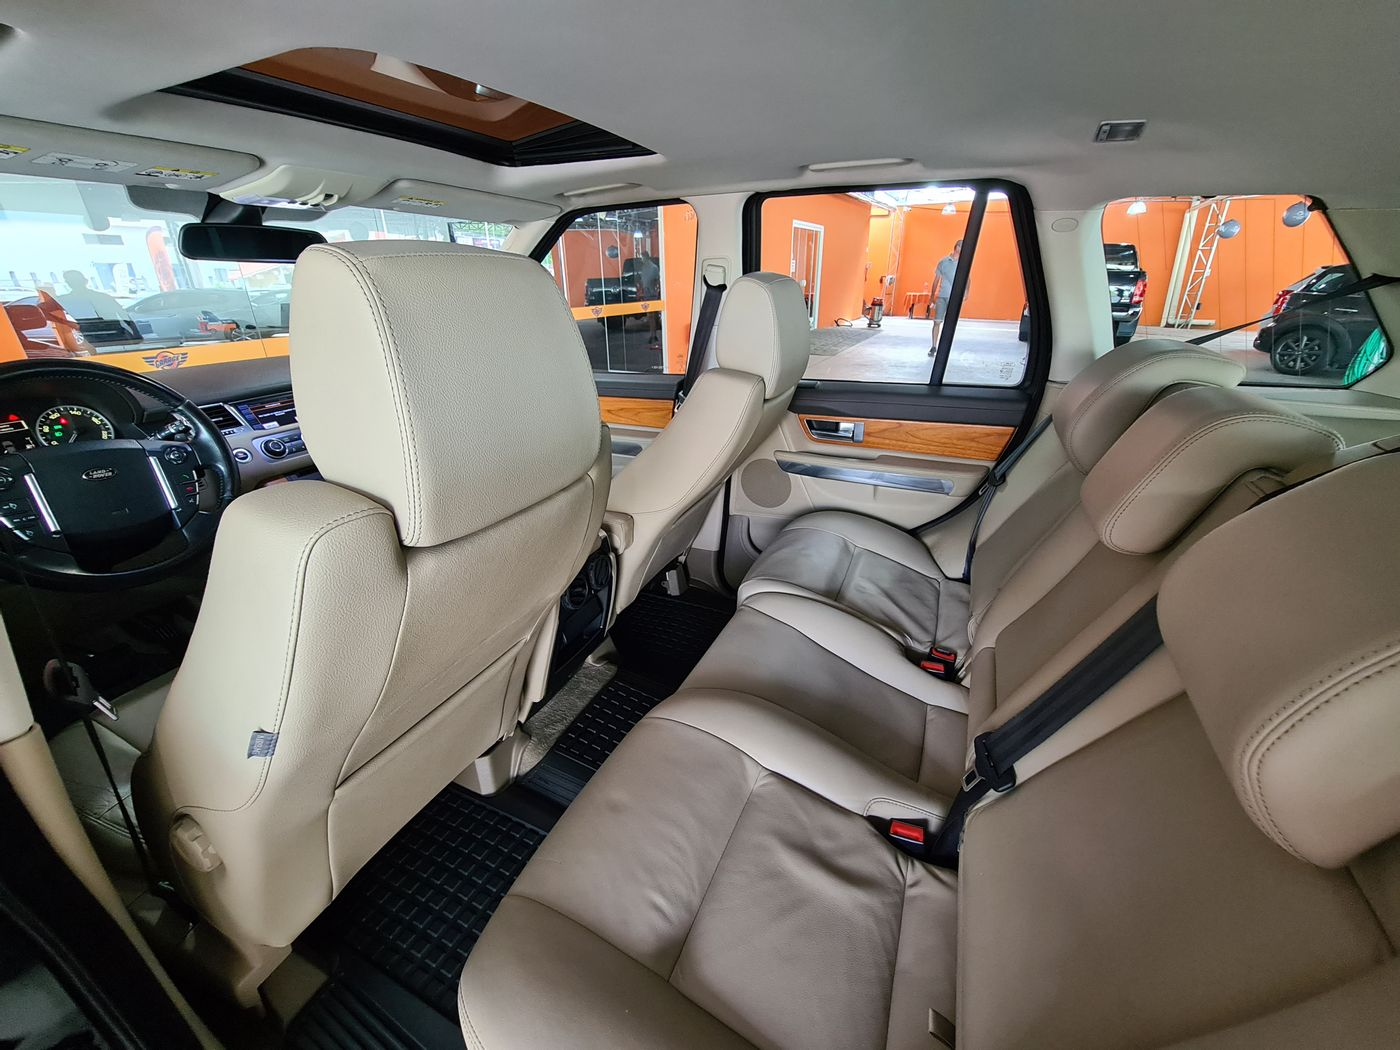 Land Rover Range R Sport Se 3 0 4x4 Tdv6 Sdv6 Dies Diesel 4 Portas Cambio Automatico Em Guaramirim Garage Car